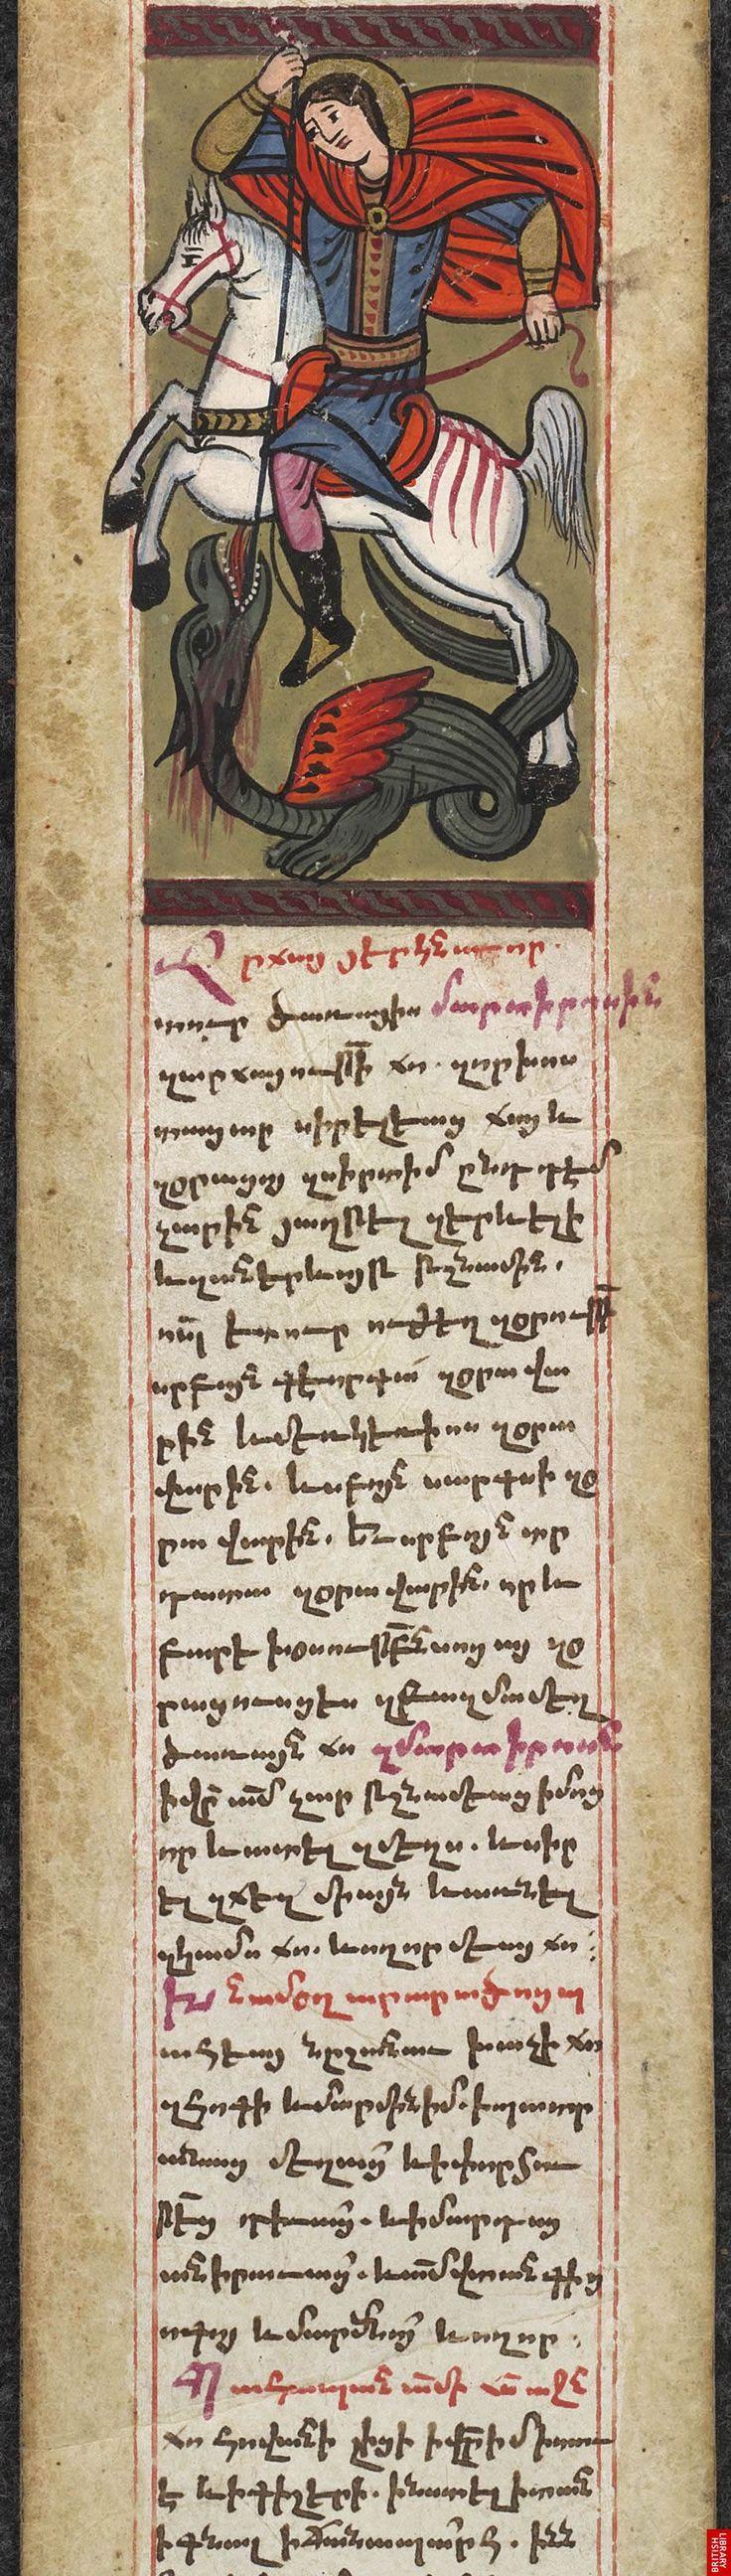 Armenian Prayer Scroll or Amulet, Constantinople, 1655. Selection of prayers, St Sargis on horseback  BL Or. MS 14028